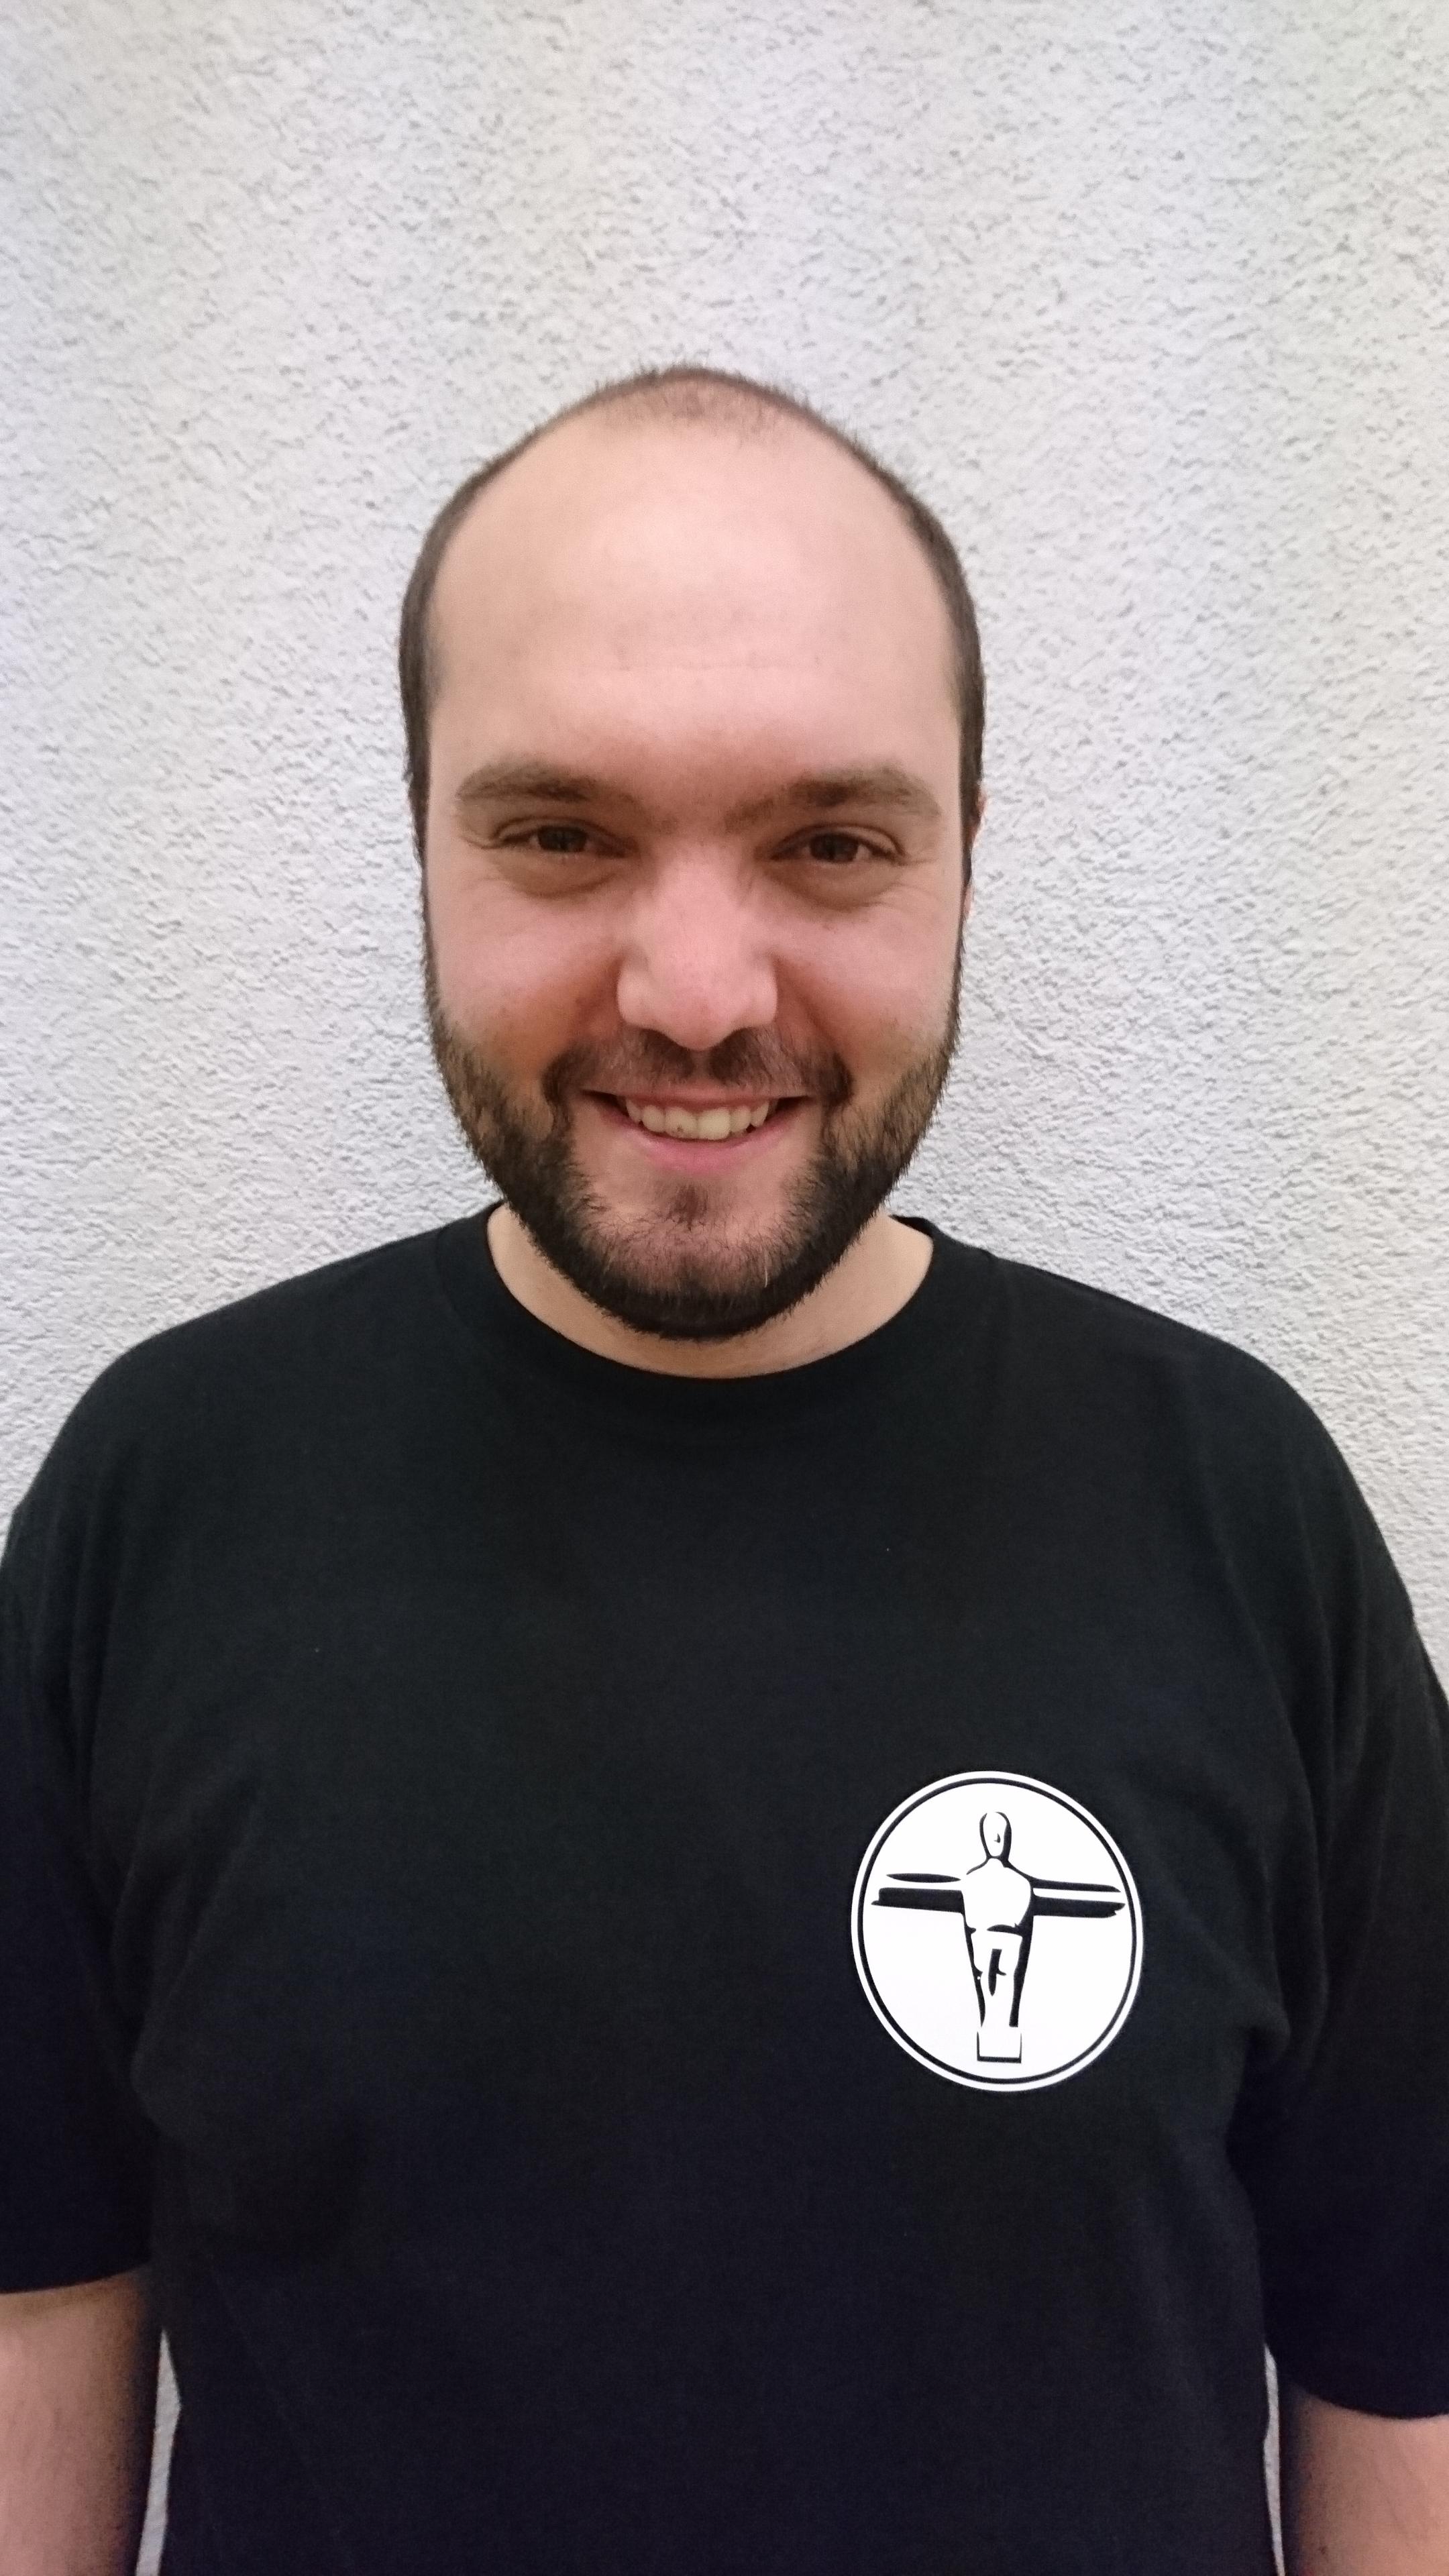 Christian Hodler, Thun BE Qualifikation: Nationale Rangliste